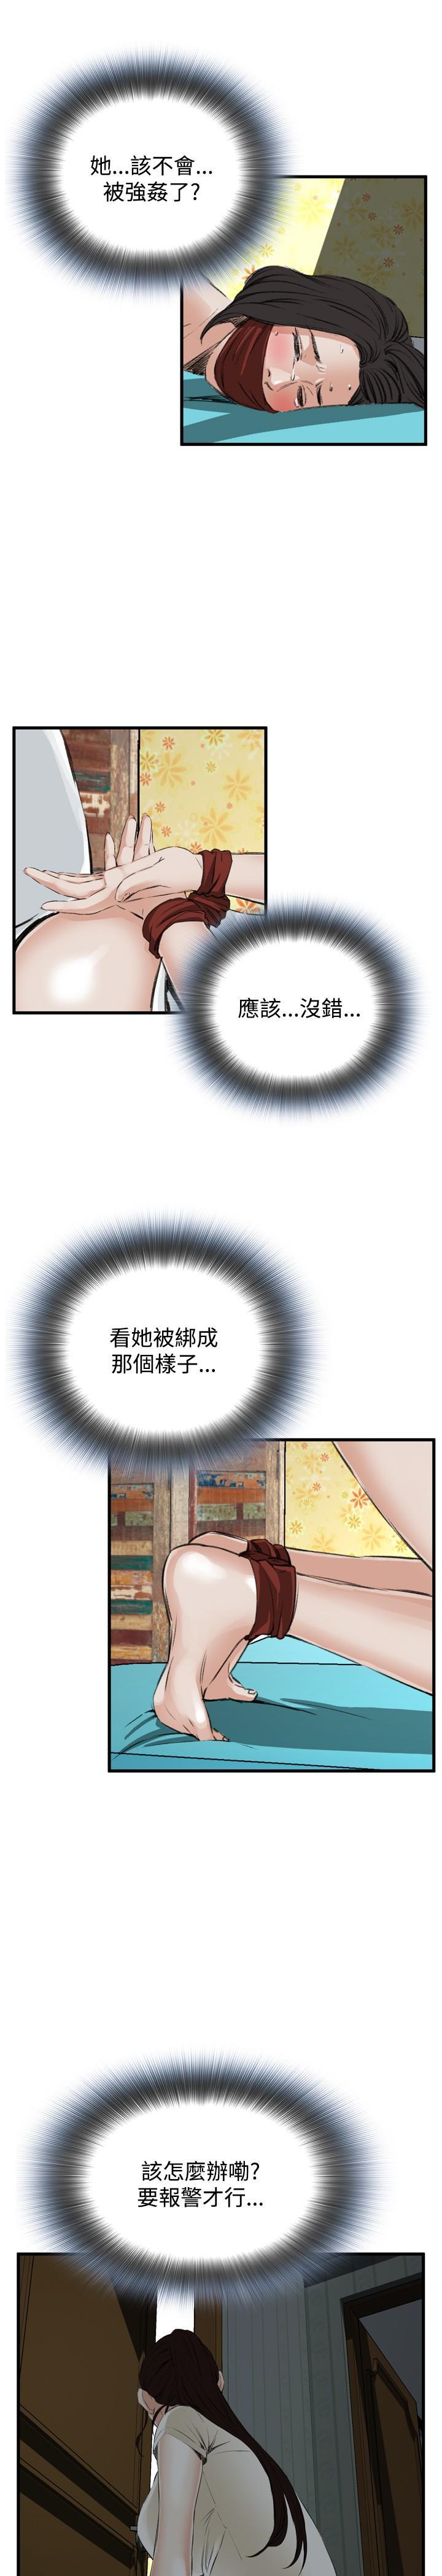 Take a Peek 偷窥 Ch.39~55 [Chinese]中文 163